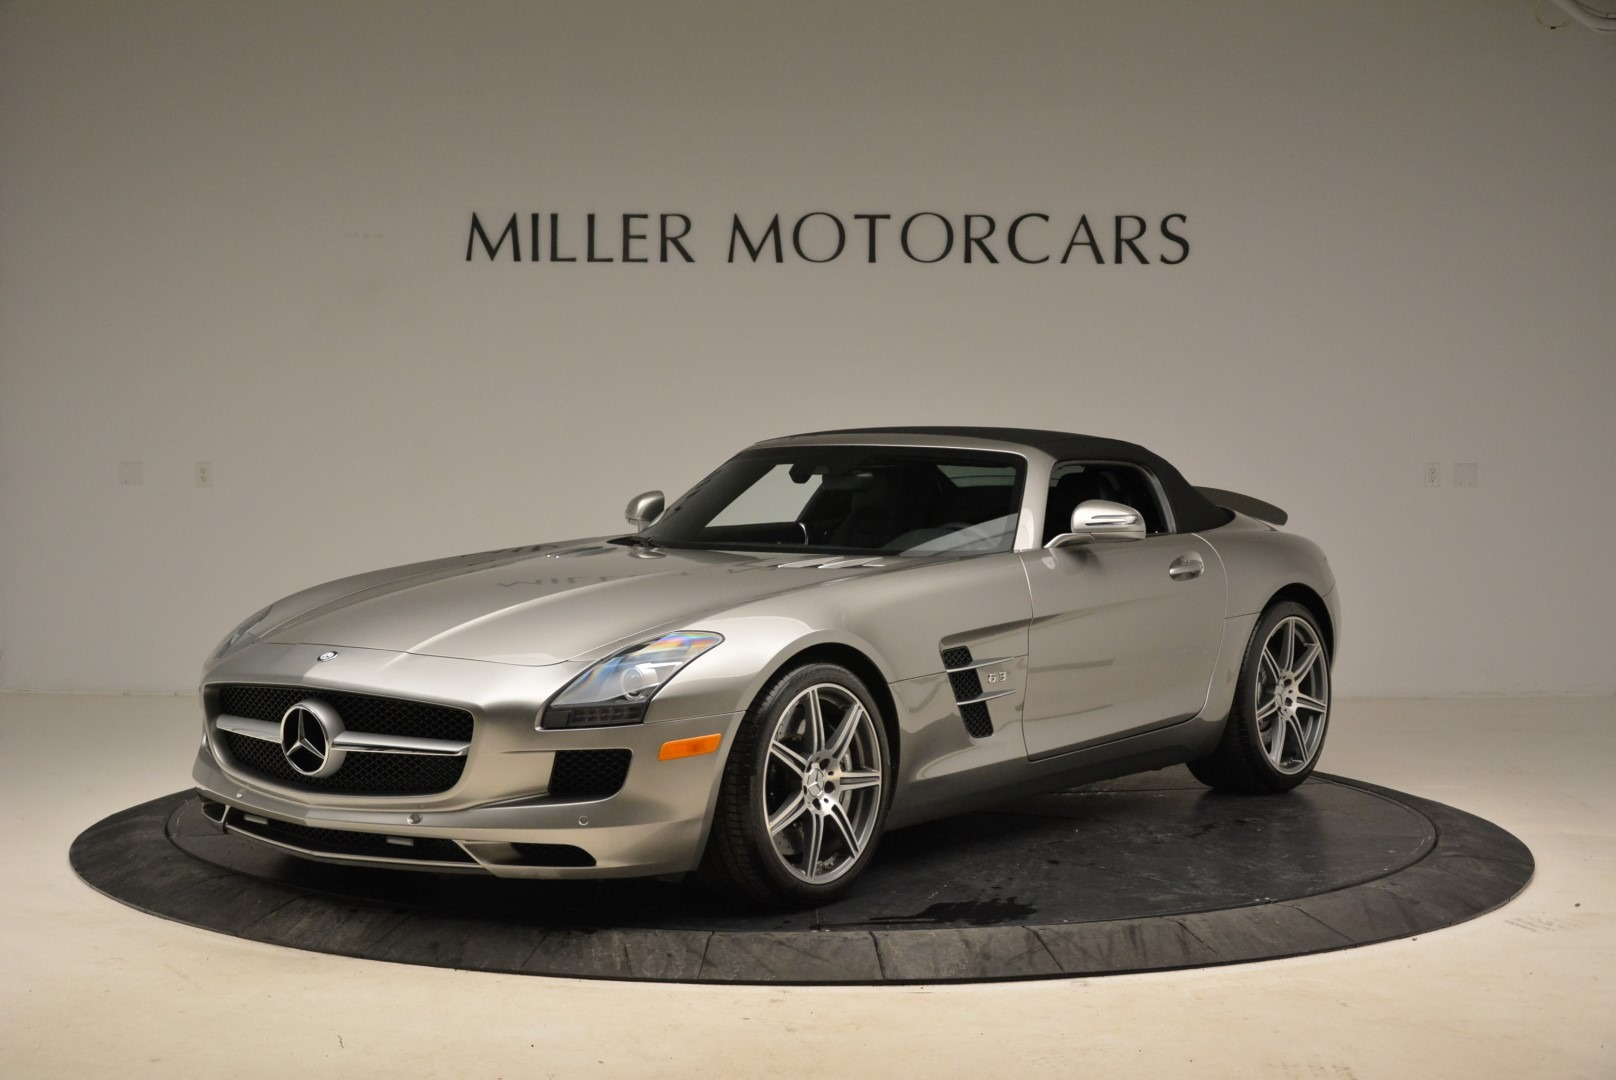 Used 2012 Mercedes-Benz SLS AMG  For Sale In Westport, CT 2068_p13